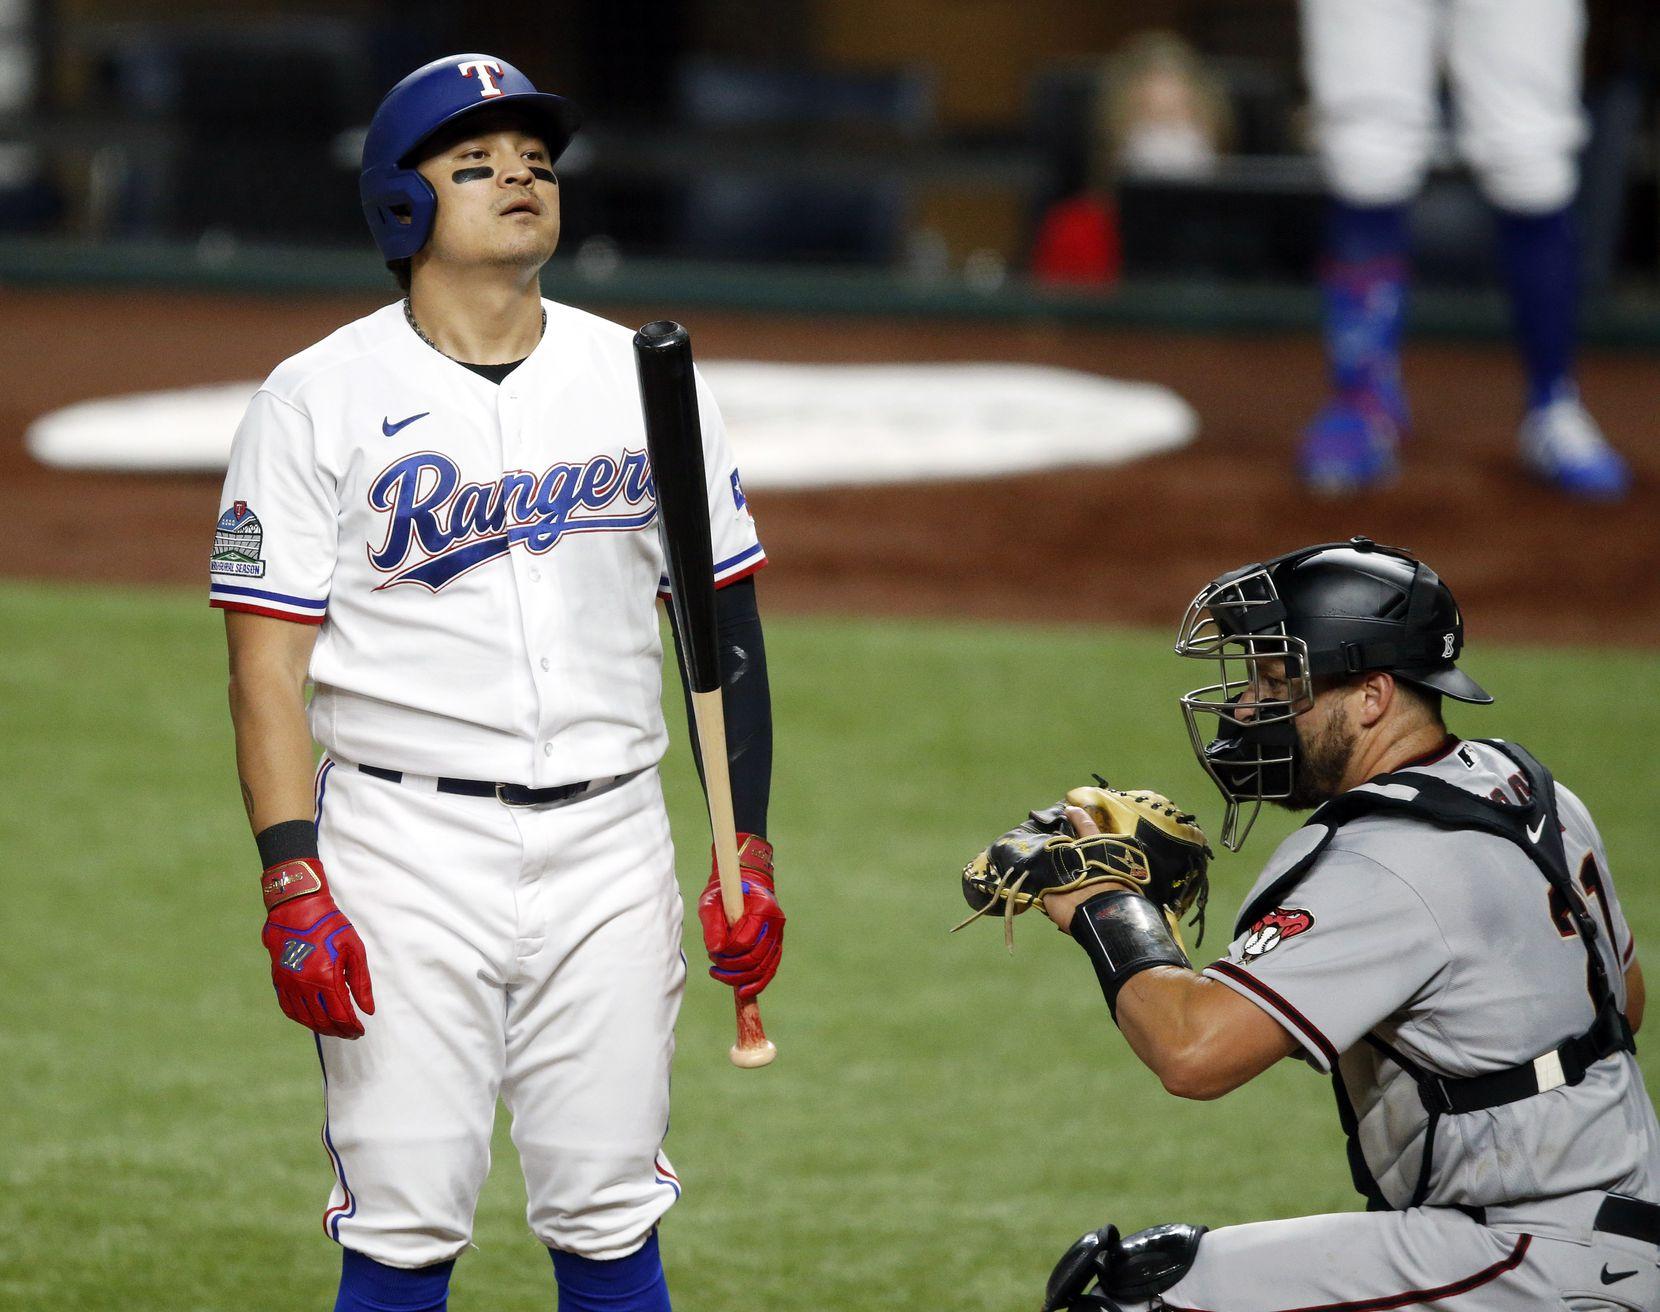 Texas Rangers left fielder Shin-Soo Choo (17) reacts to a called third strike to end the third inning against the Arizona Diamondbacks at Globe Life Field in Arlington, Texas, Tuesday, July 28, 2020. (Tom Fox/The Dallas Morning News)